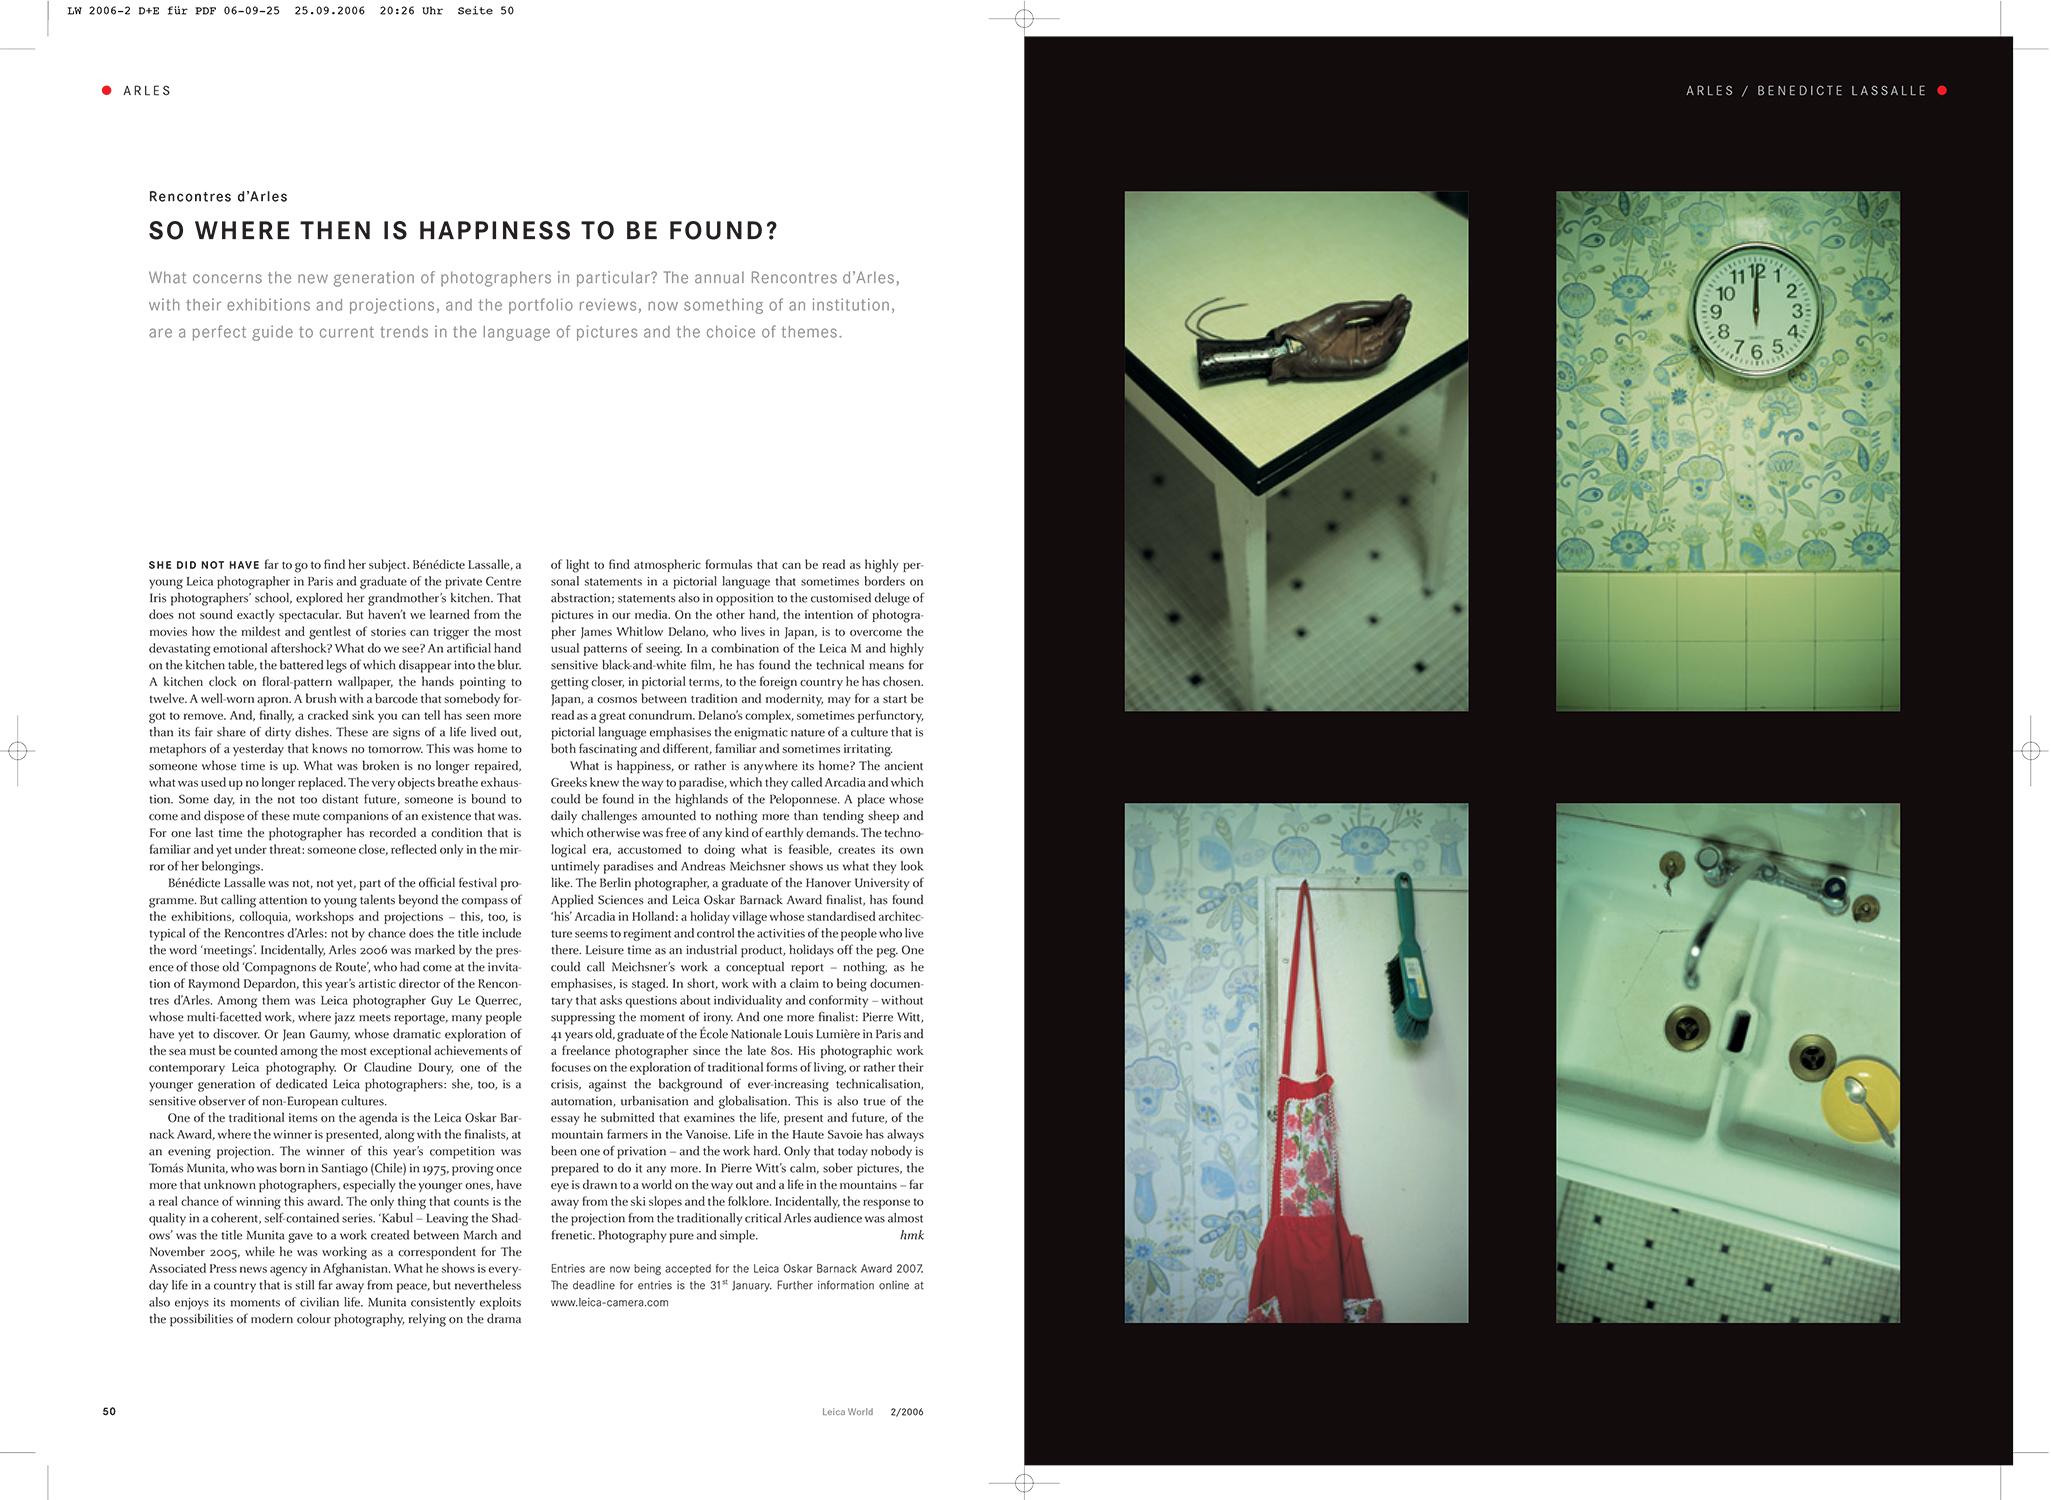 Publications Benedicte Lassalle Photography